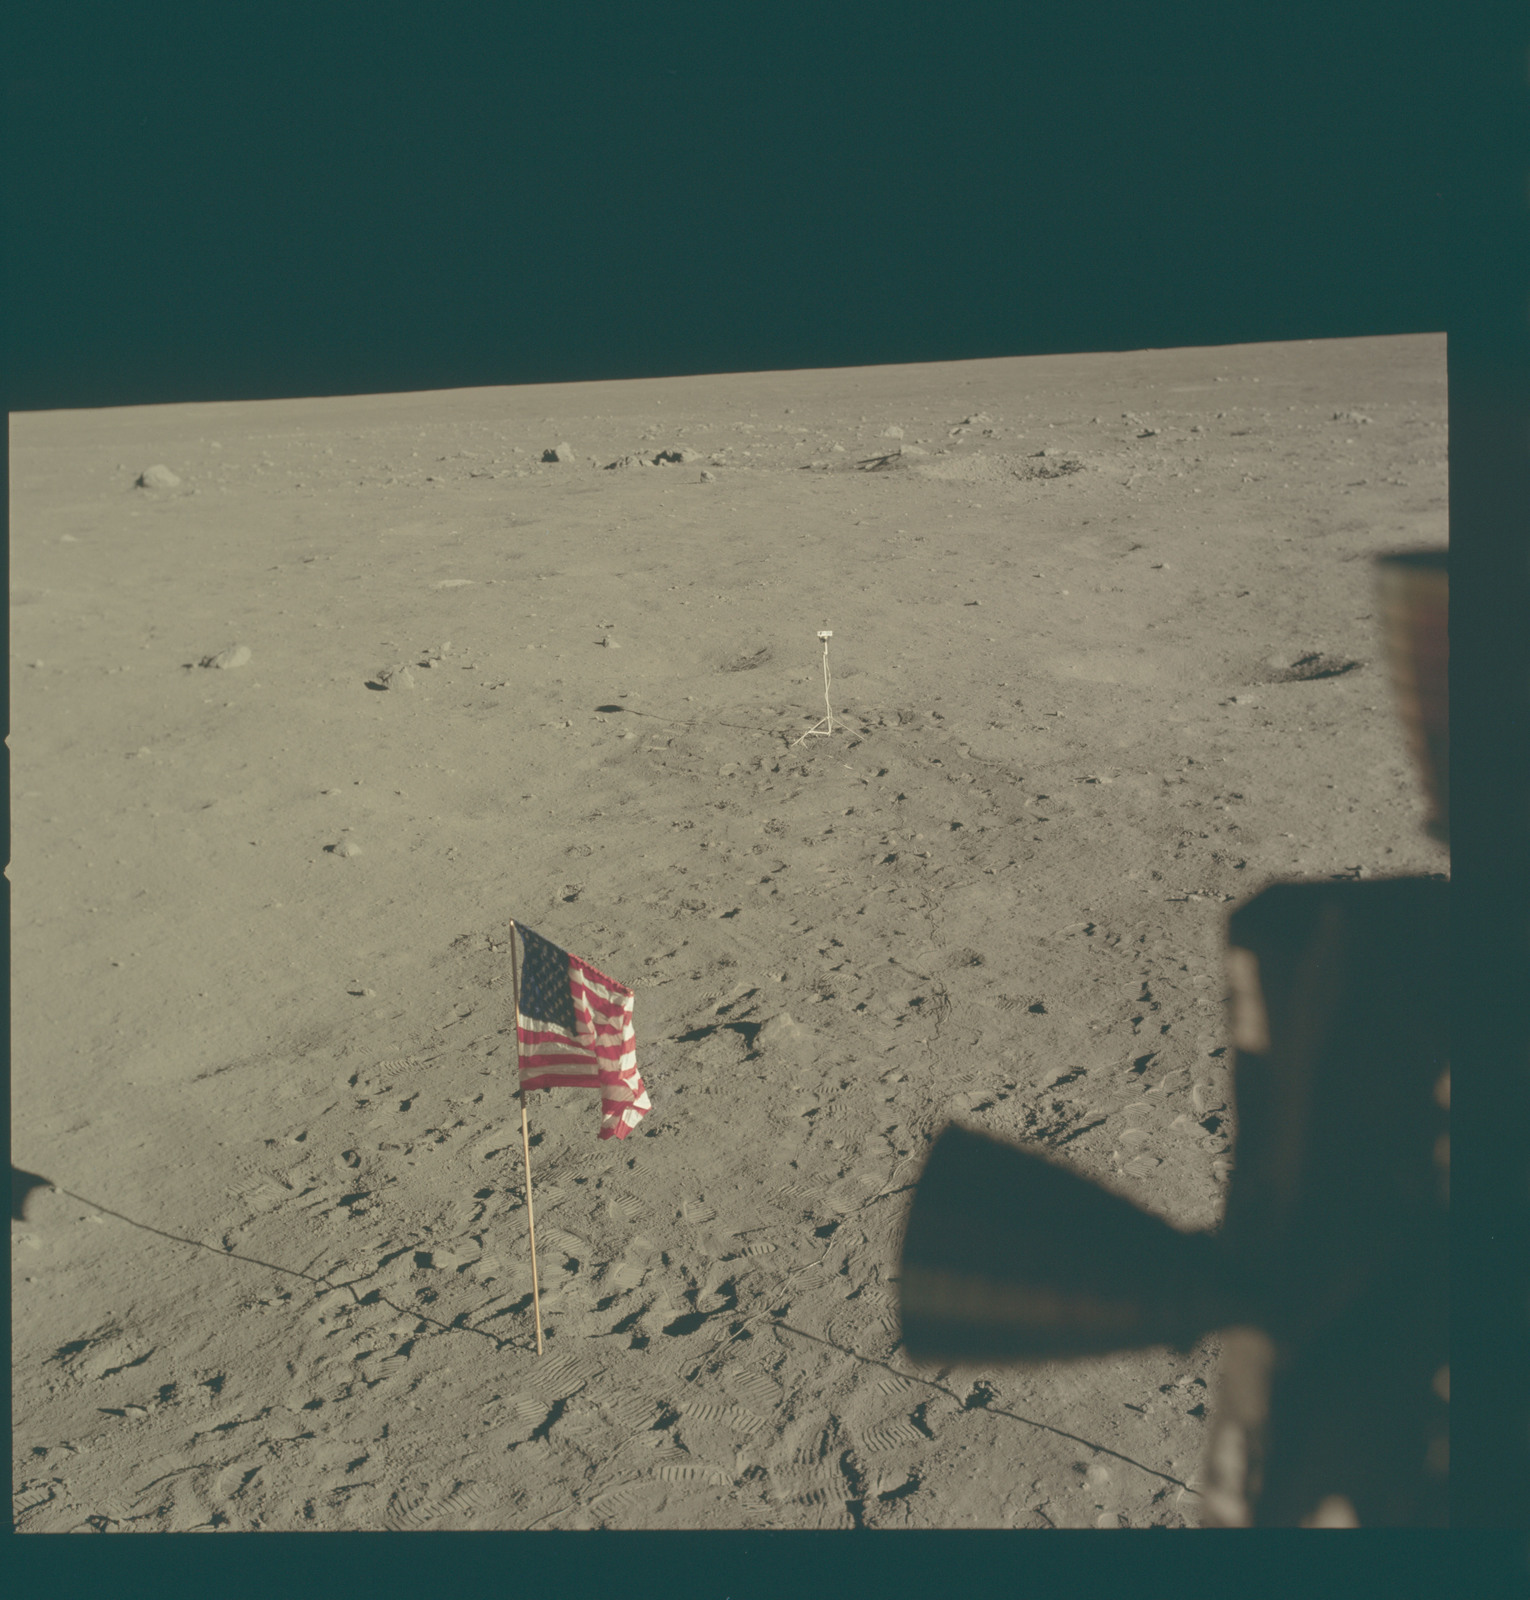 AS11-37-5516 - Apollo 11 - Apollo 11 Mission image - Lunar horizon from Tranquility Base